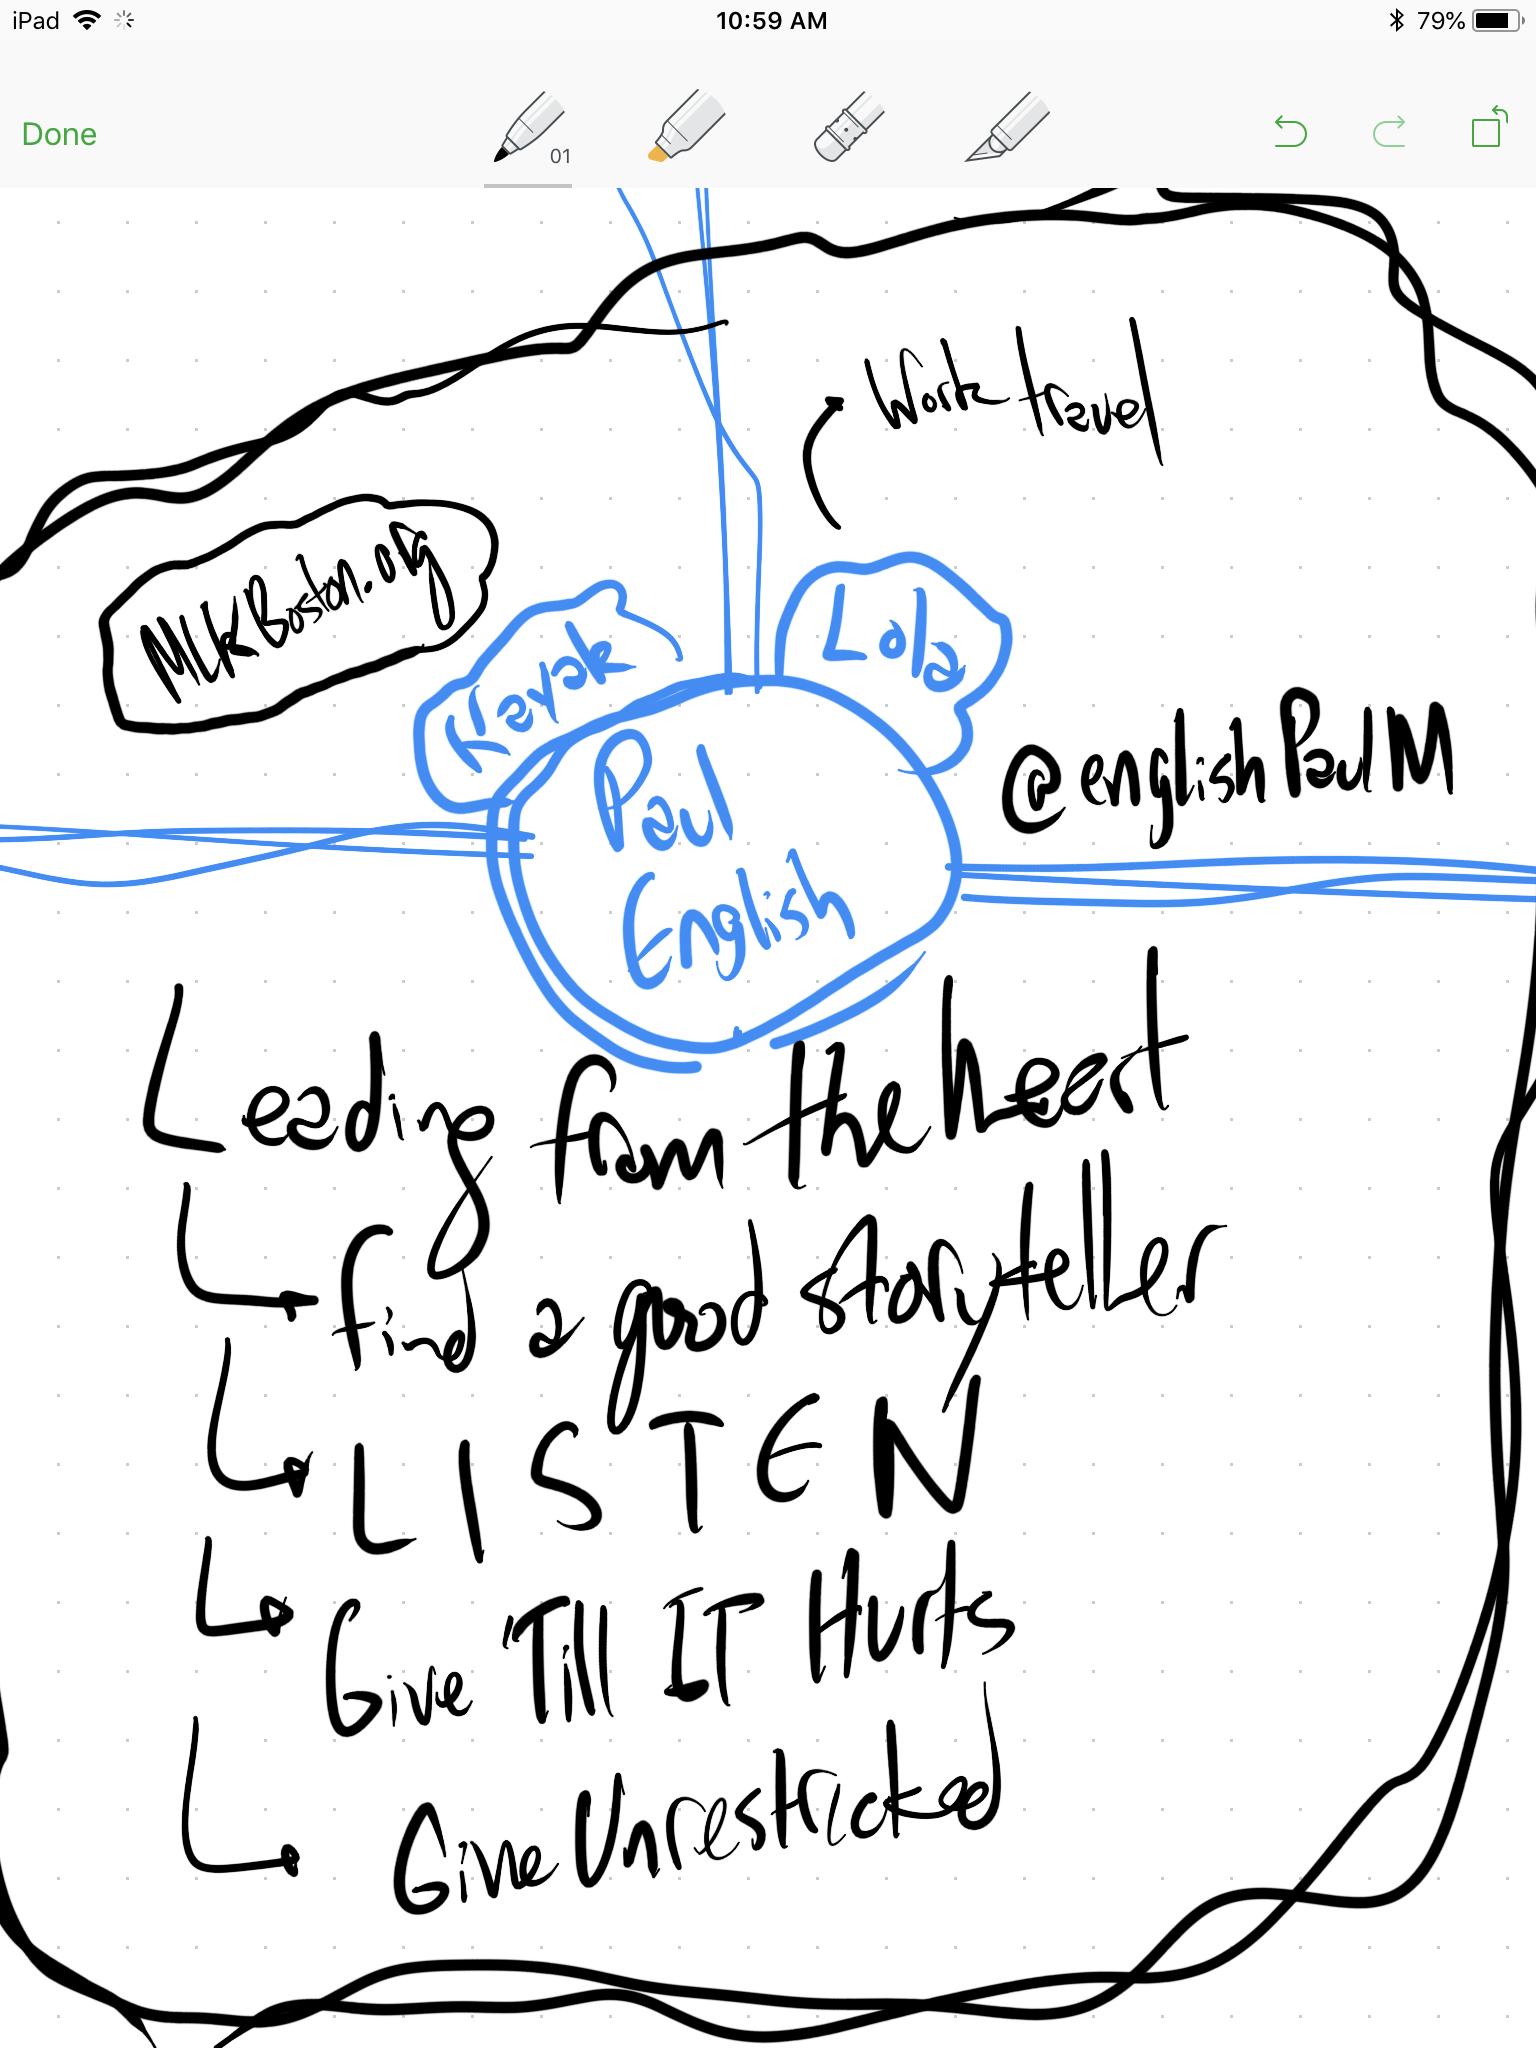 PaulEnglish-SketchNotes-HyperGrowth18